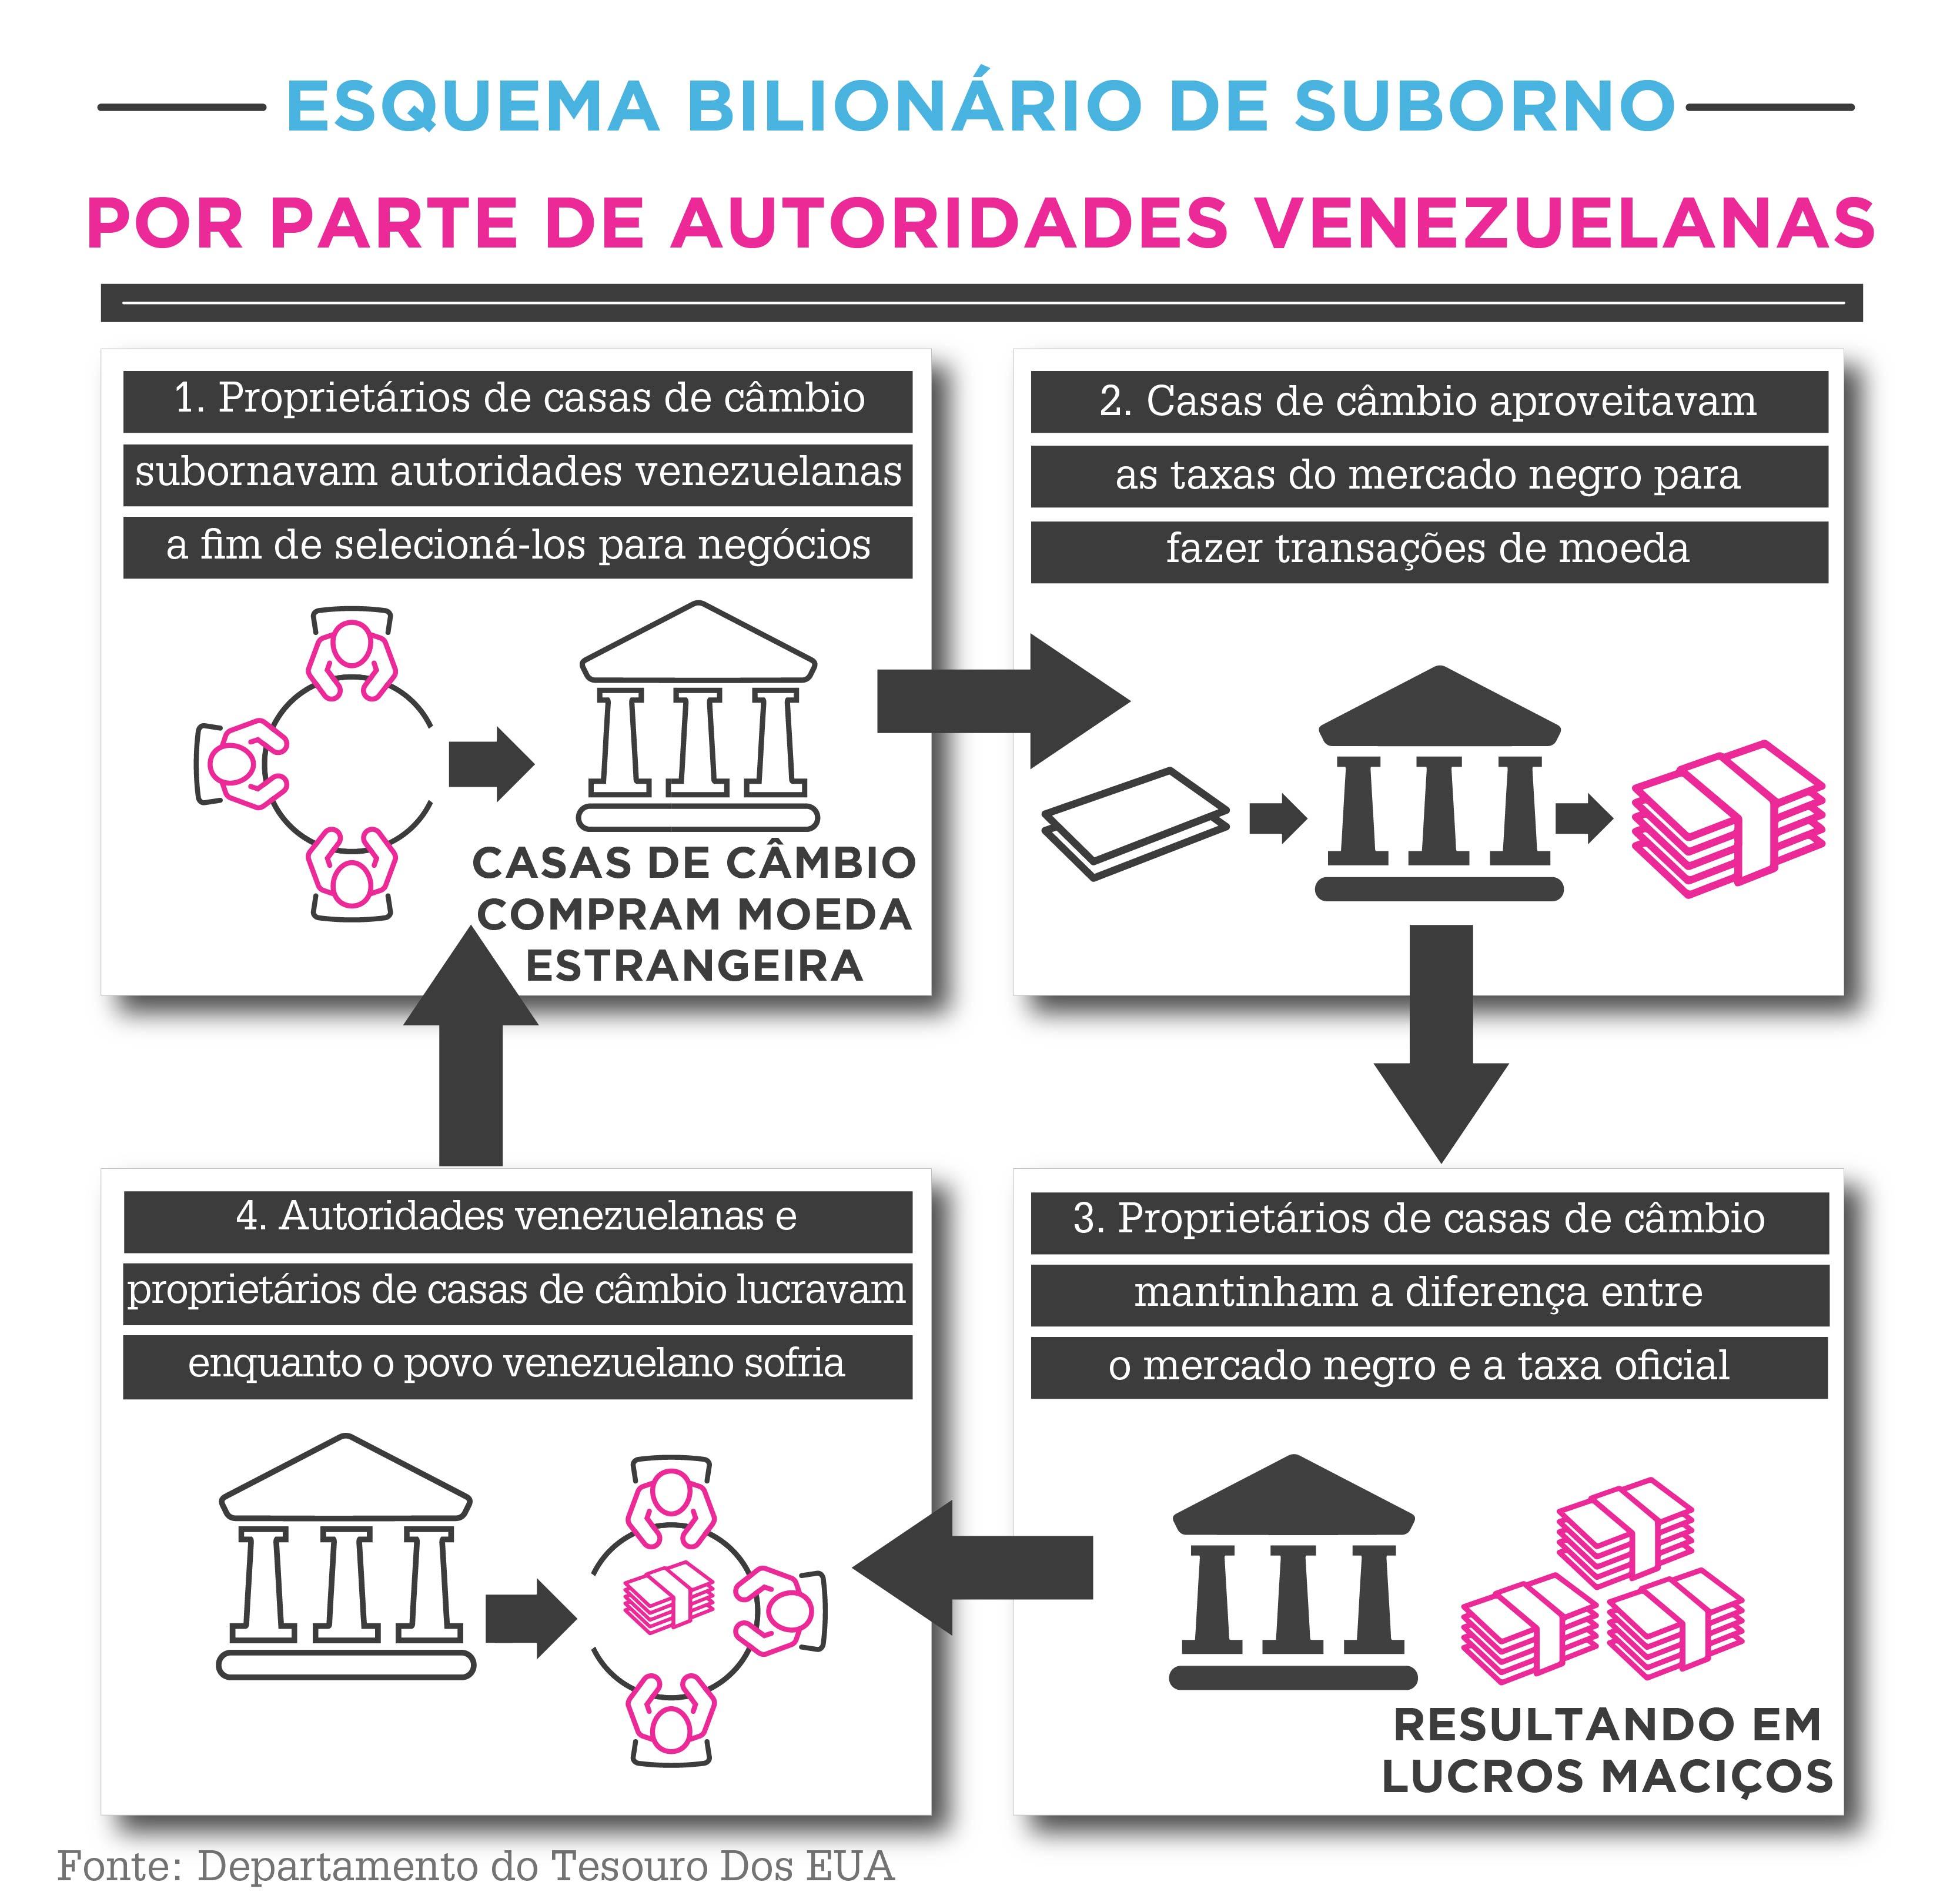 Gráfico explica como o esquema de suborno por parte de autoridades venezuelanas funcionava (Depto. de Estado)